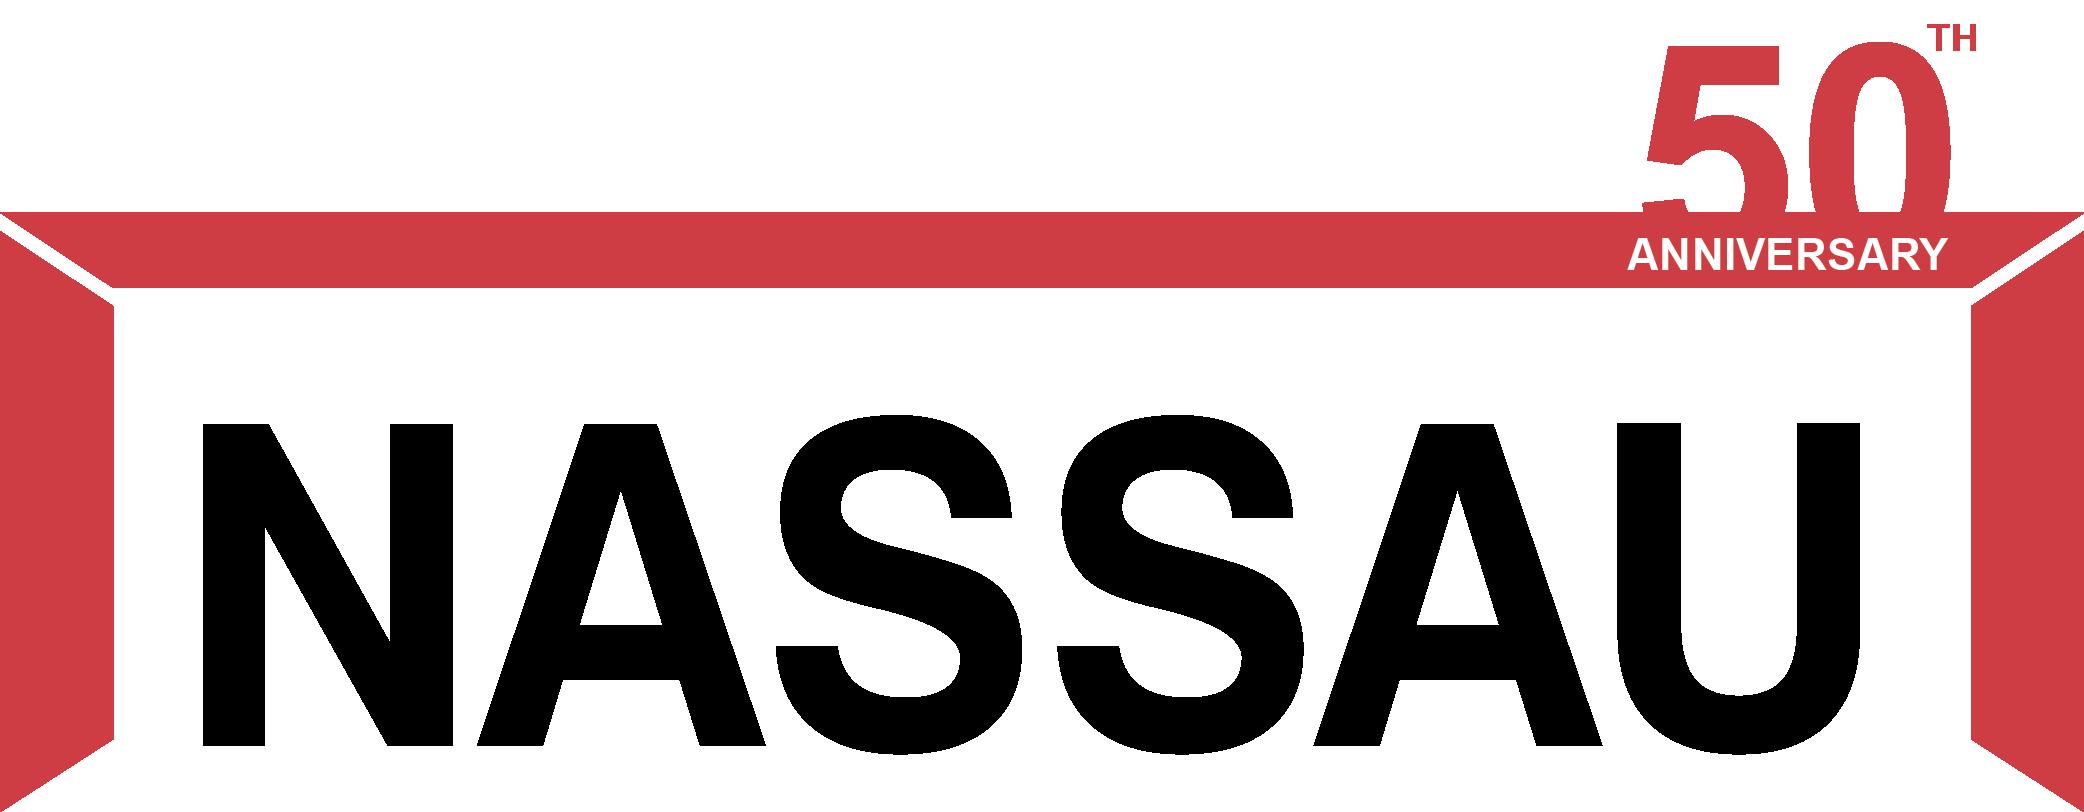 NASSAU logo 2020 - 50 års jubilæum